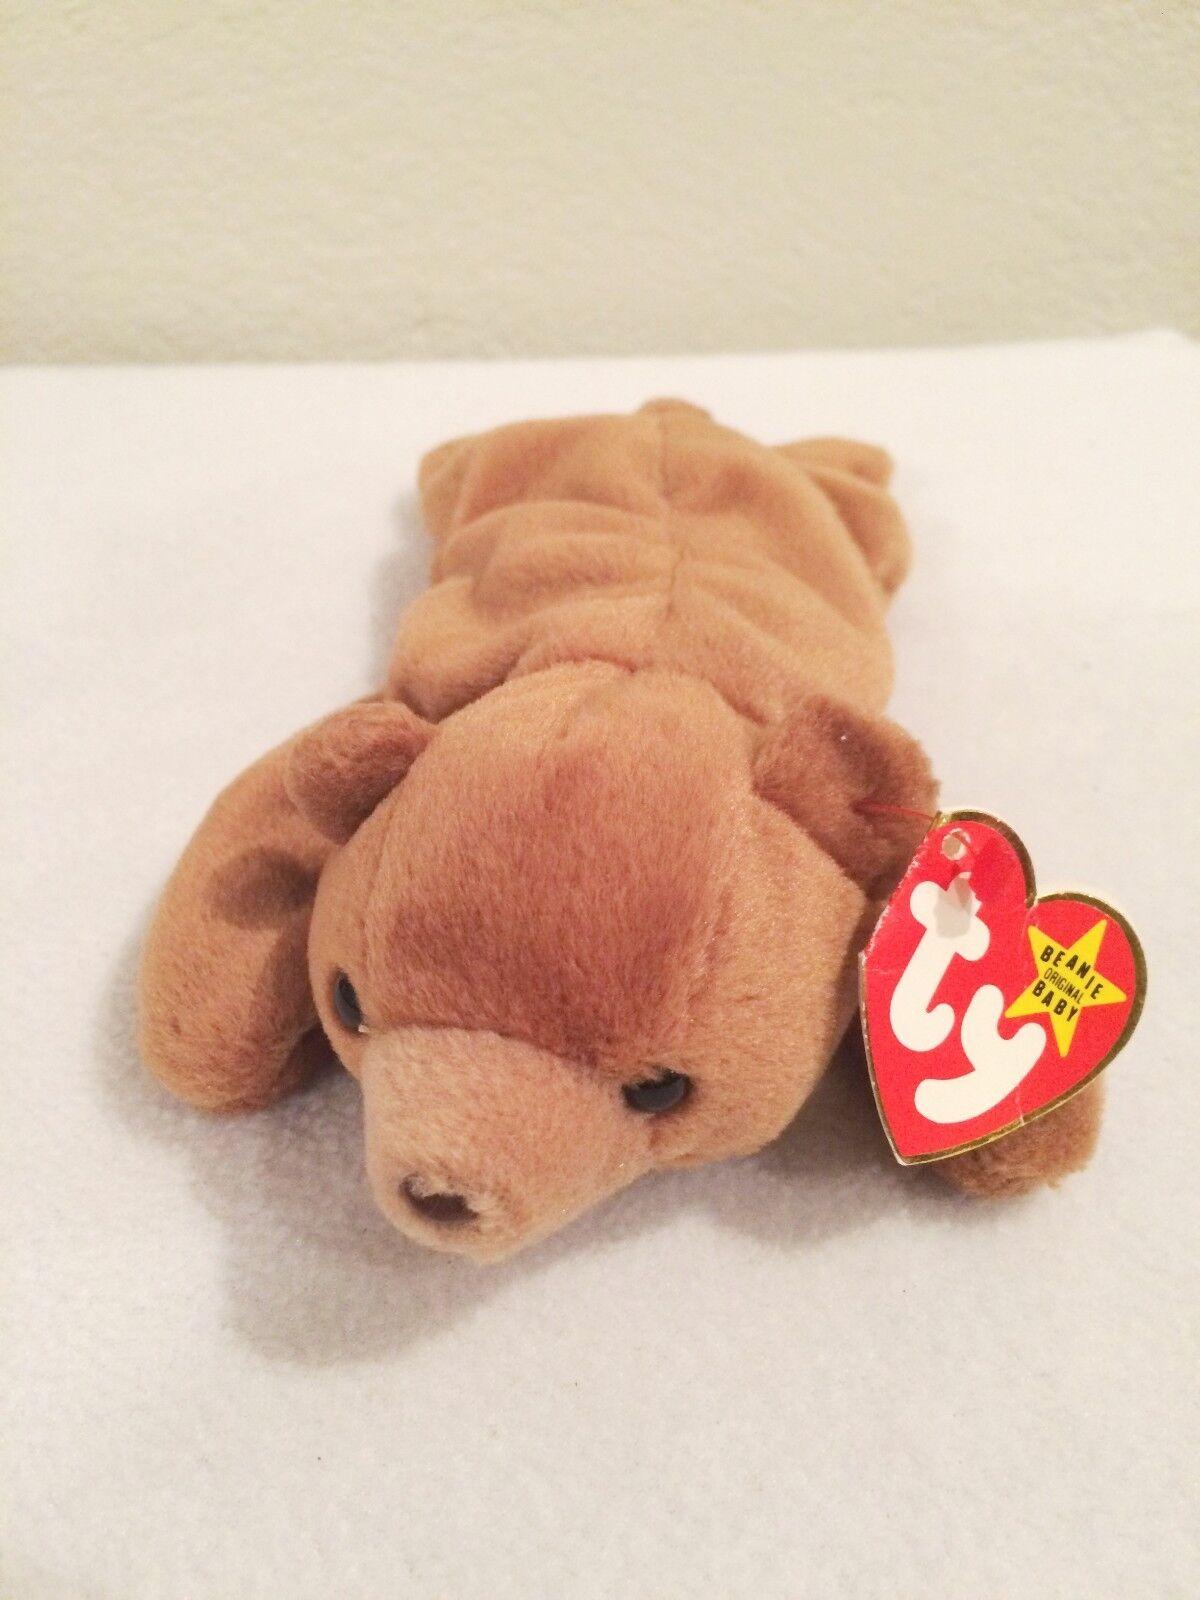 Cubbie Bear TY original beanie baby RETIRED Errors misprints  1993 Rare